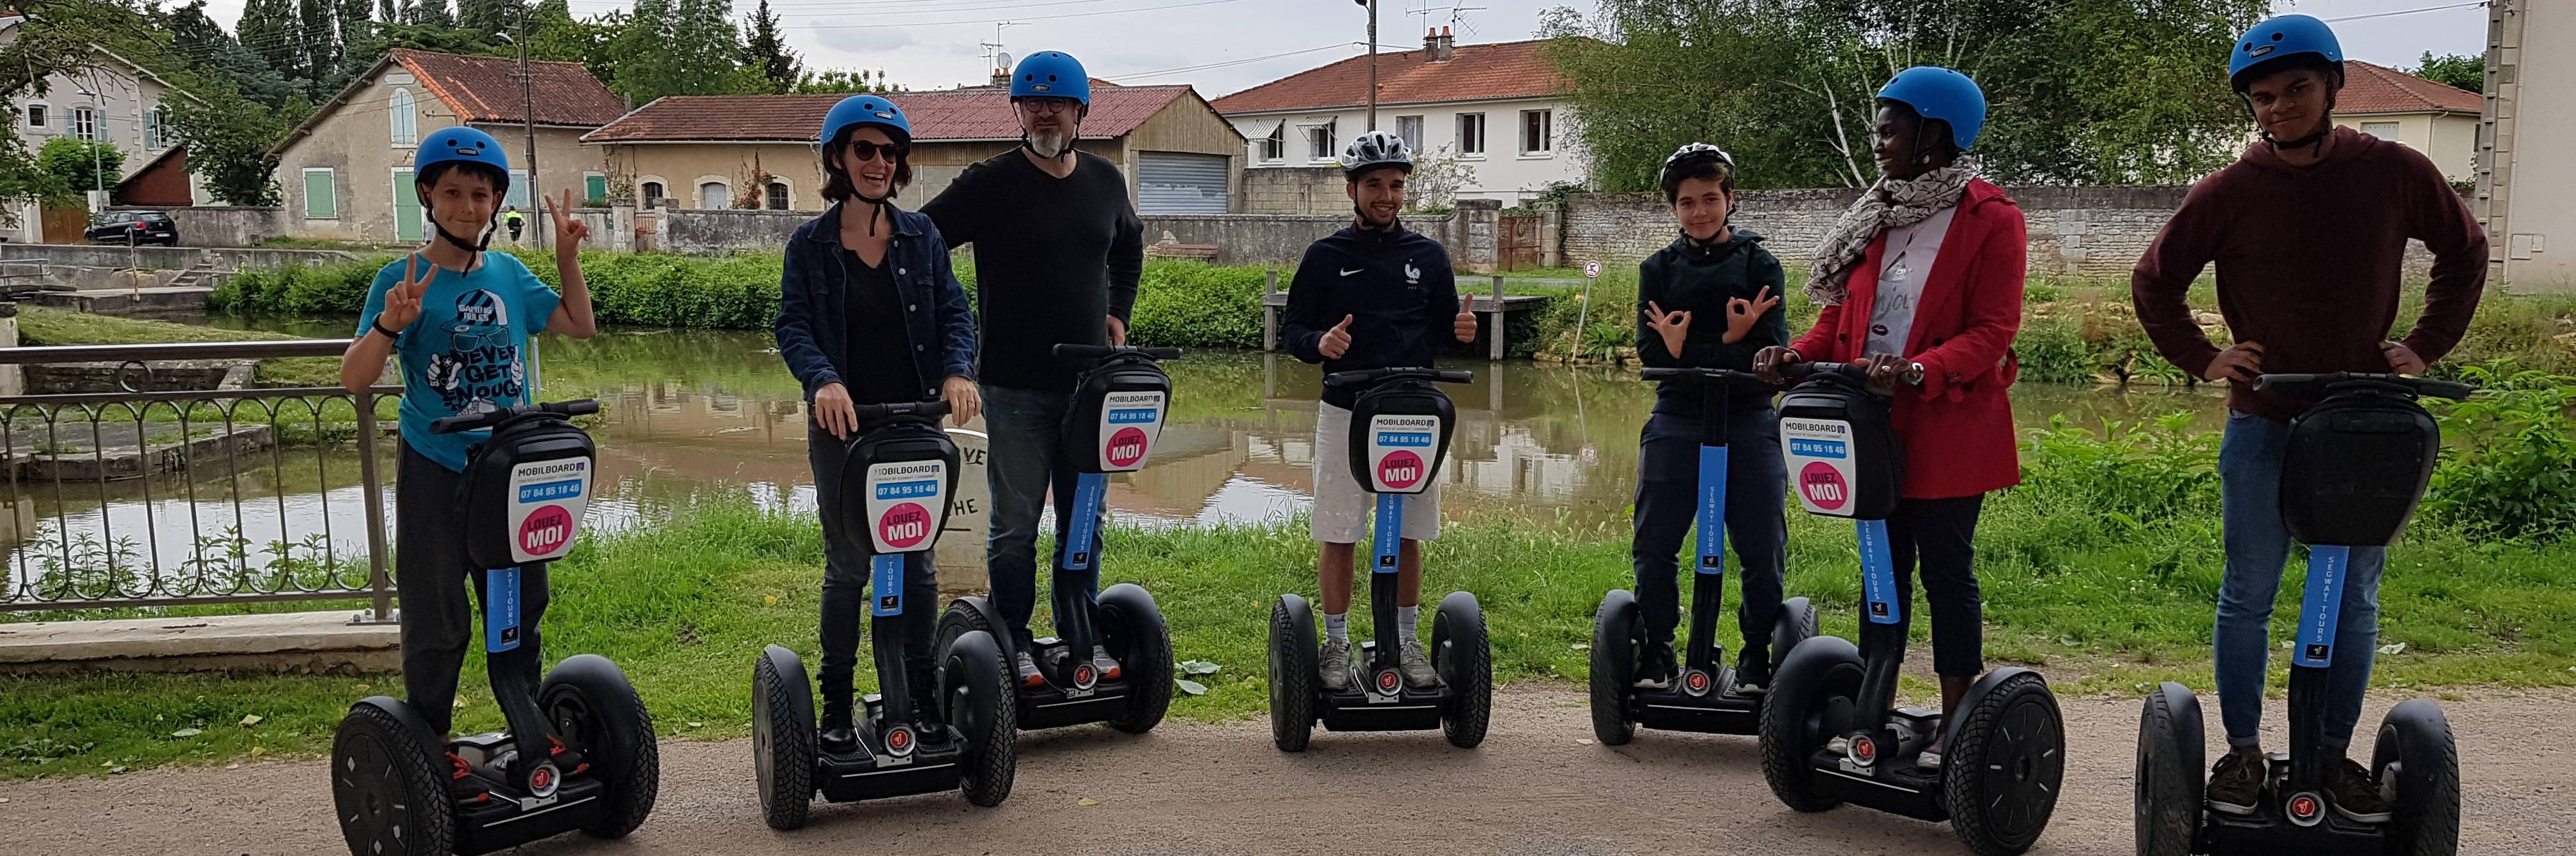 A Segway tour in Niort